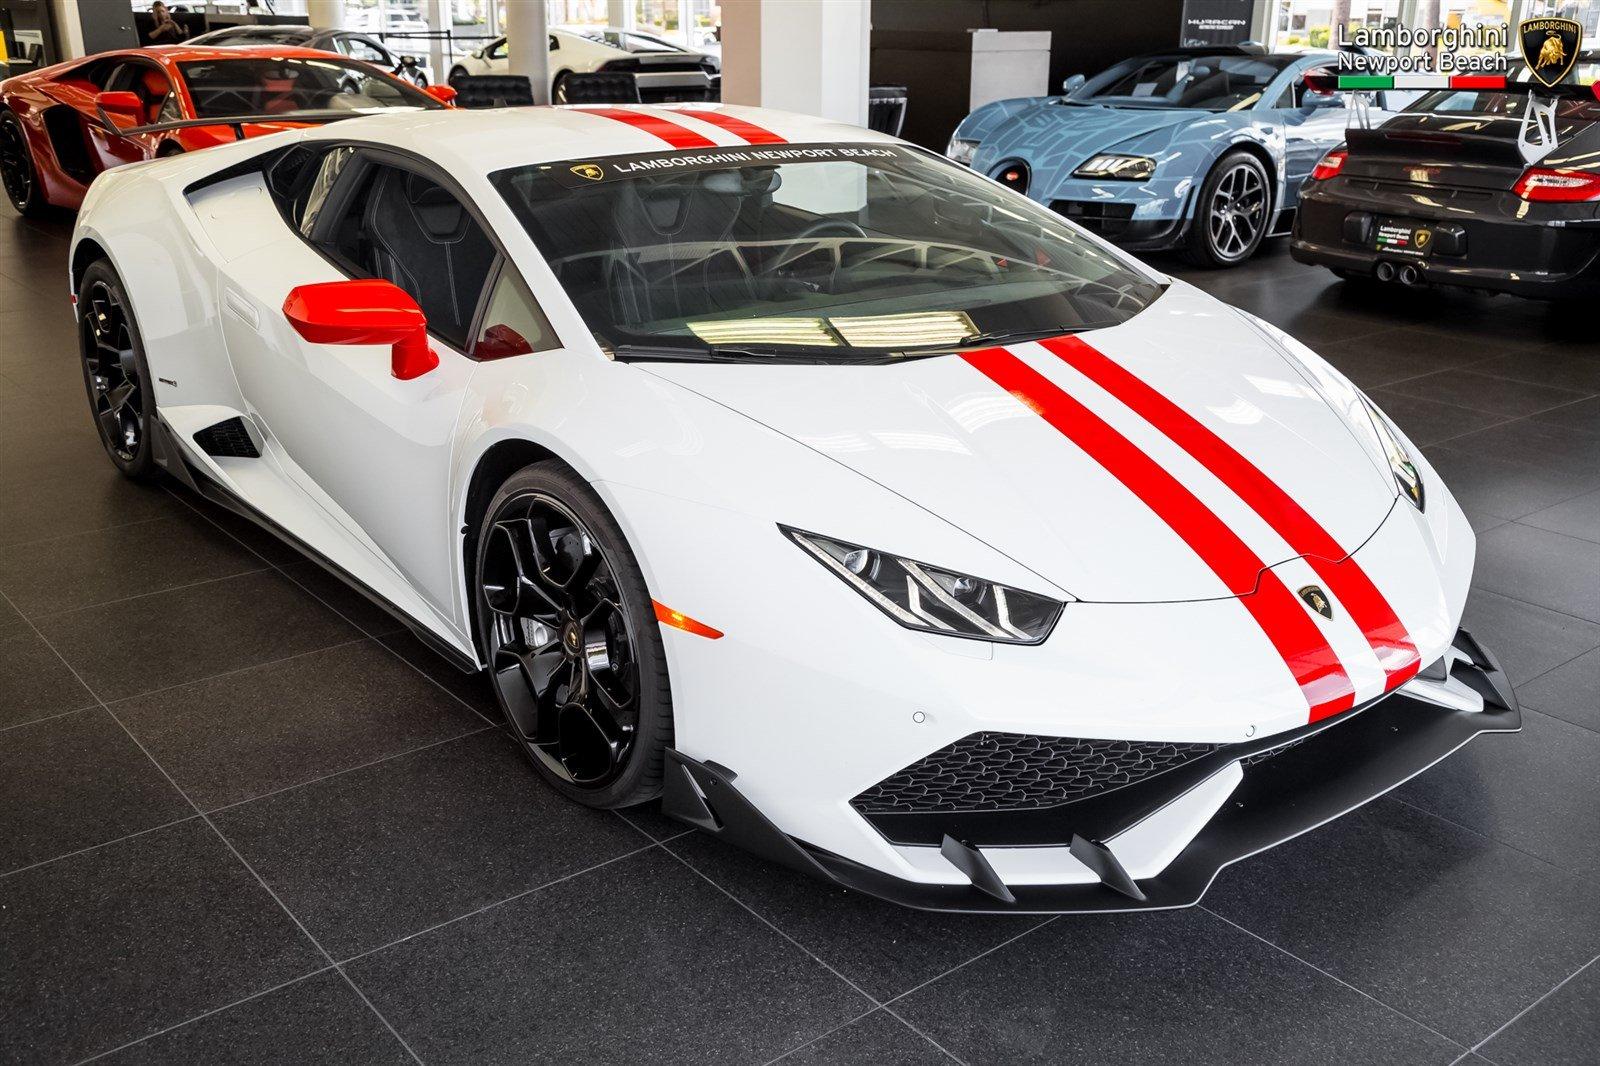 Lamborghini S Own Aero Package For The Huracan Looks Fantastic In